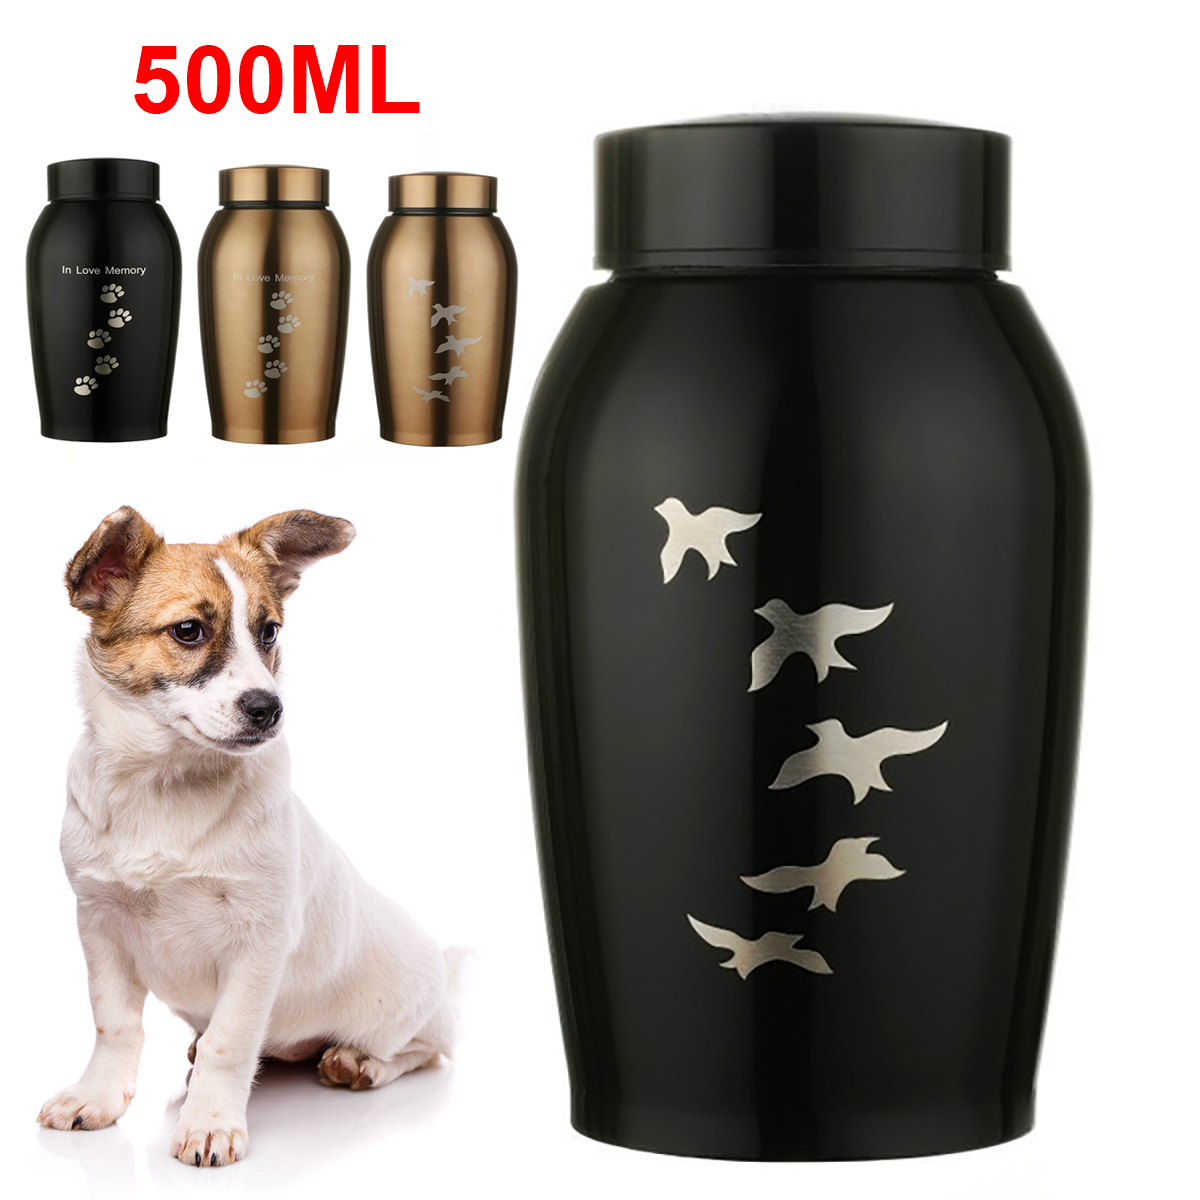 500ml Stainless Steel Memorials Urns Pets Dog Cat Birds Mouse Cremation Ashes Urn Keepsake Casket Columbarium Pets Memorials